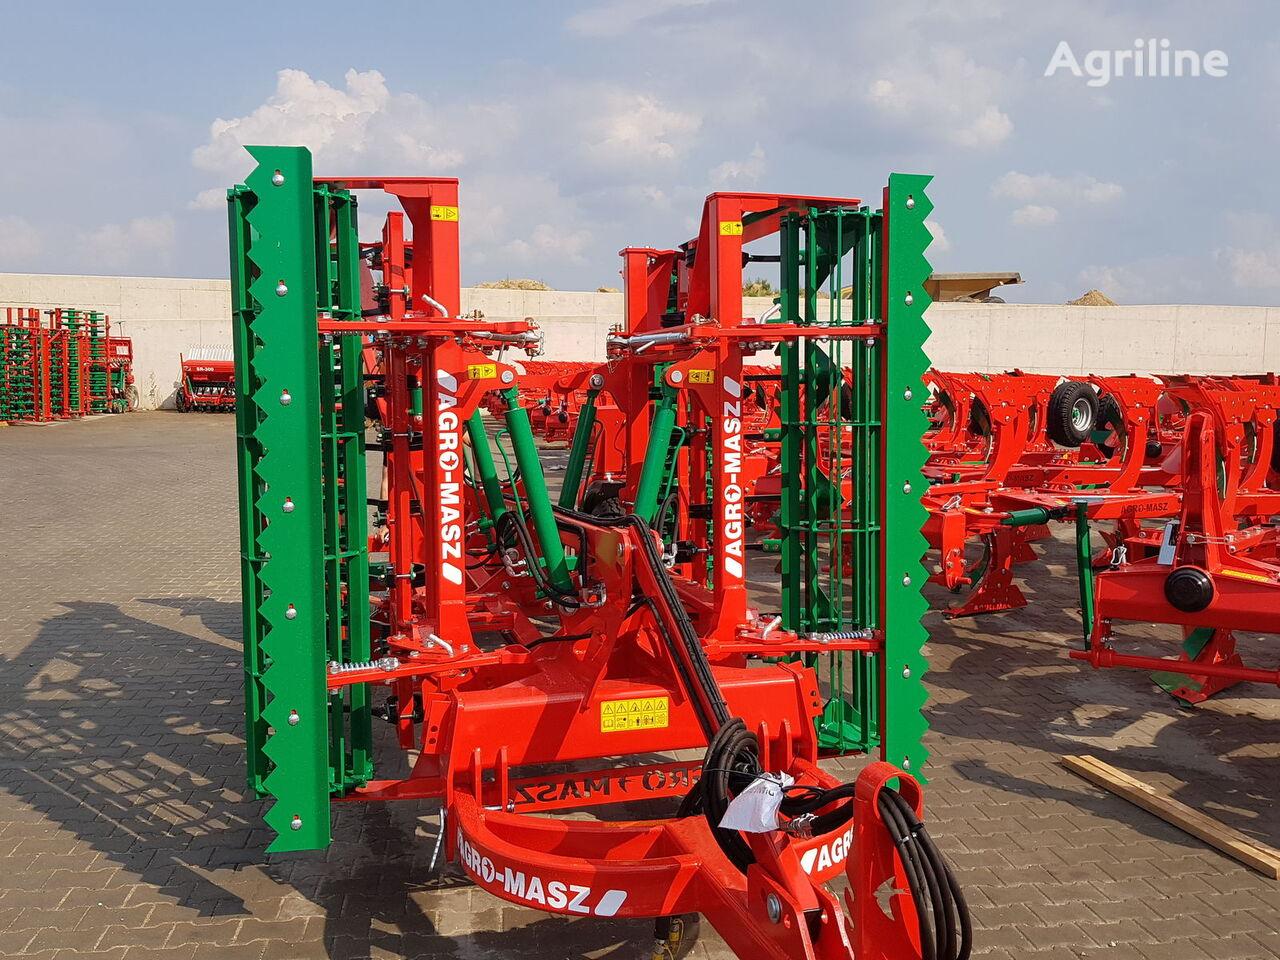 AGRO-MASZ Kompaktomat 4 m AUC40H cultivador nuevo